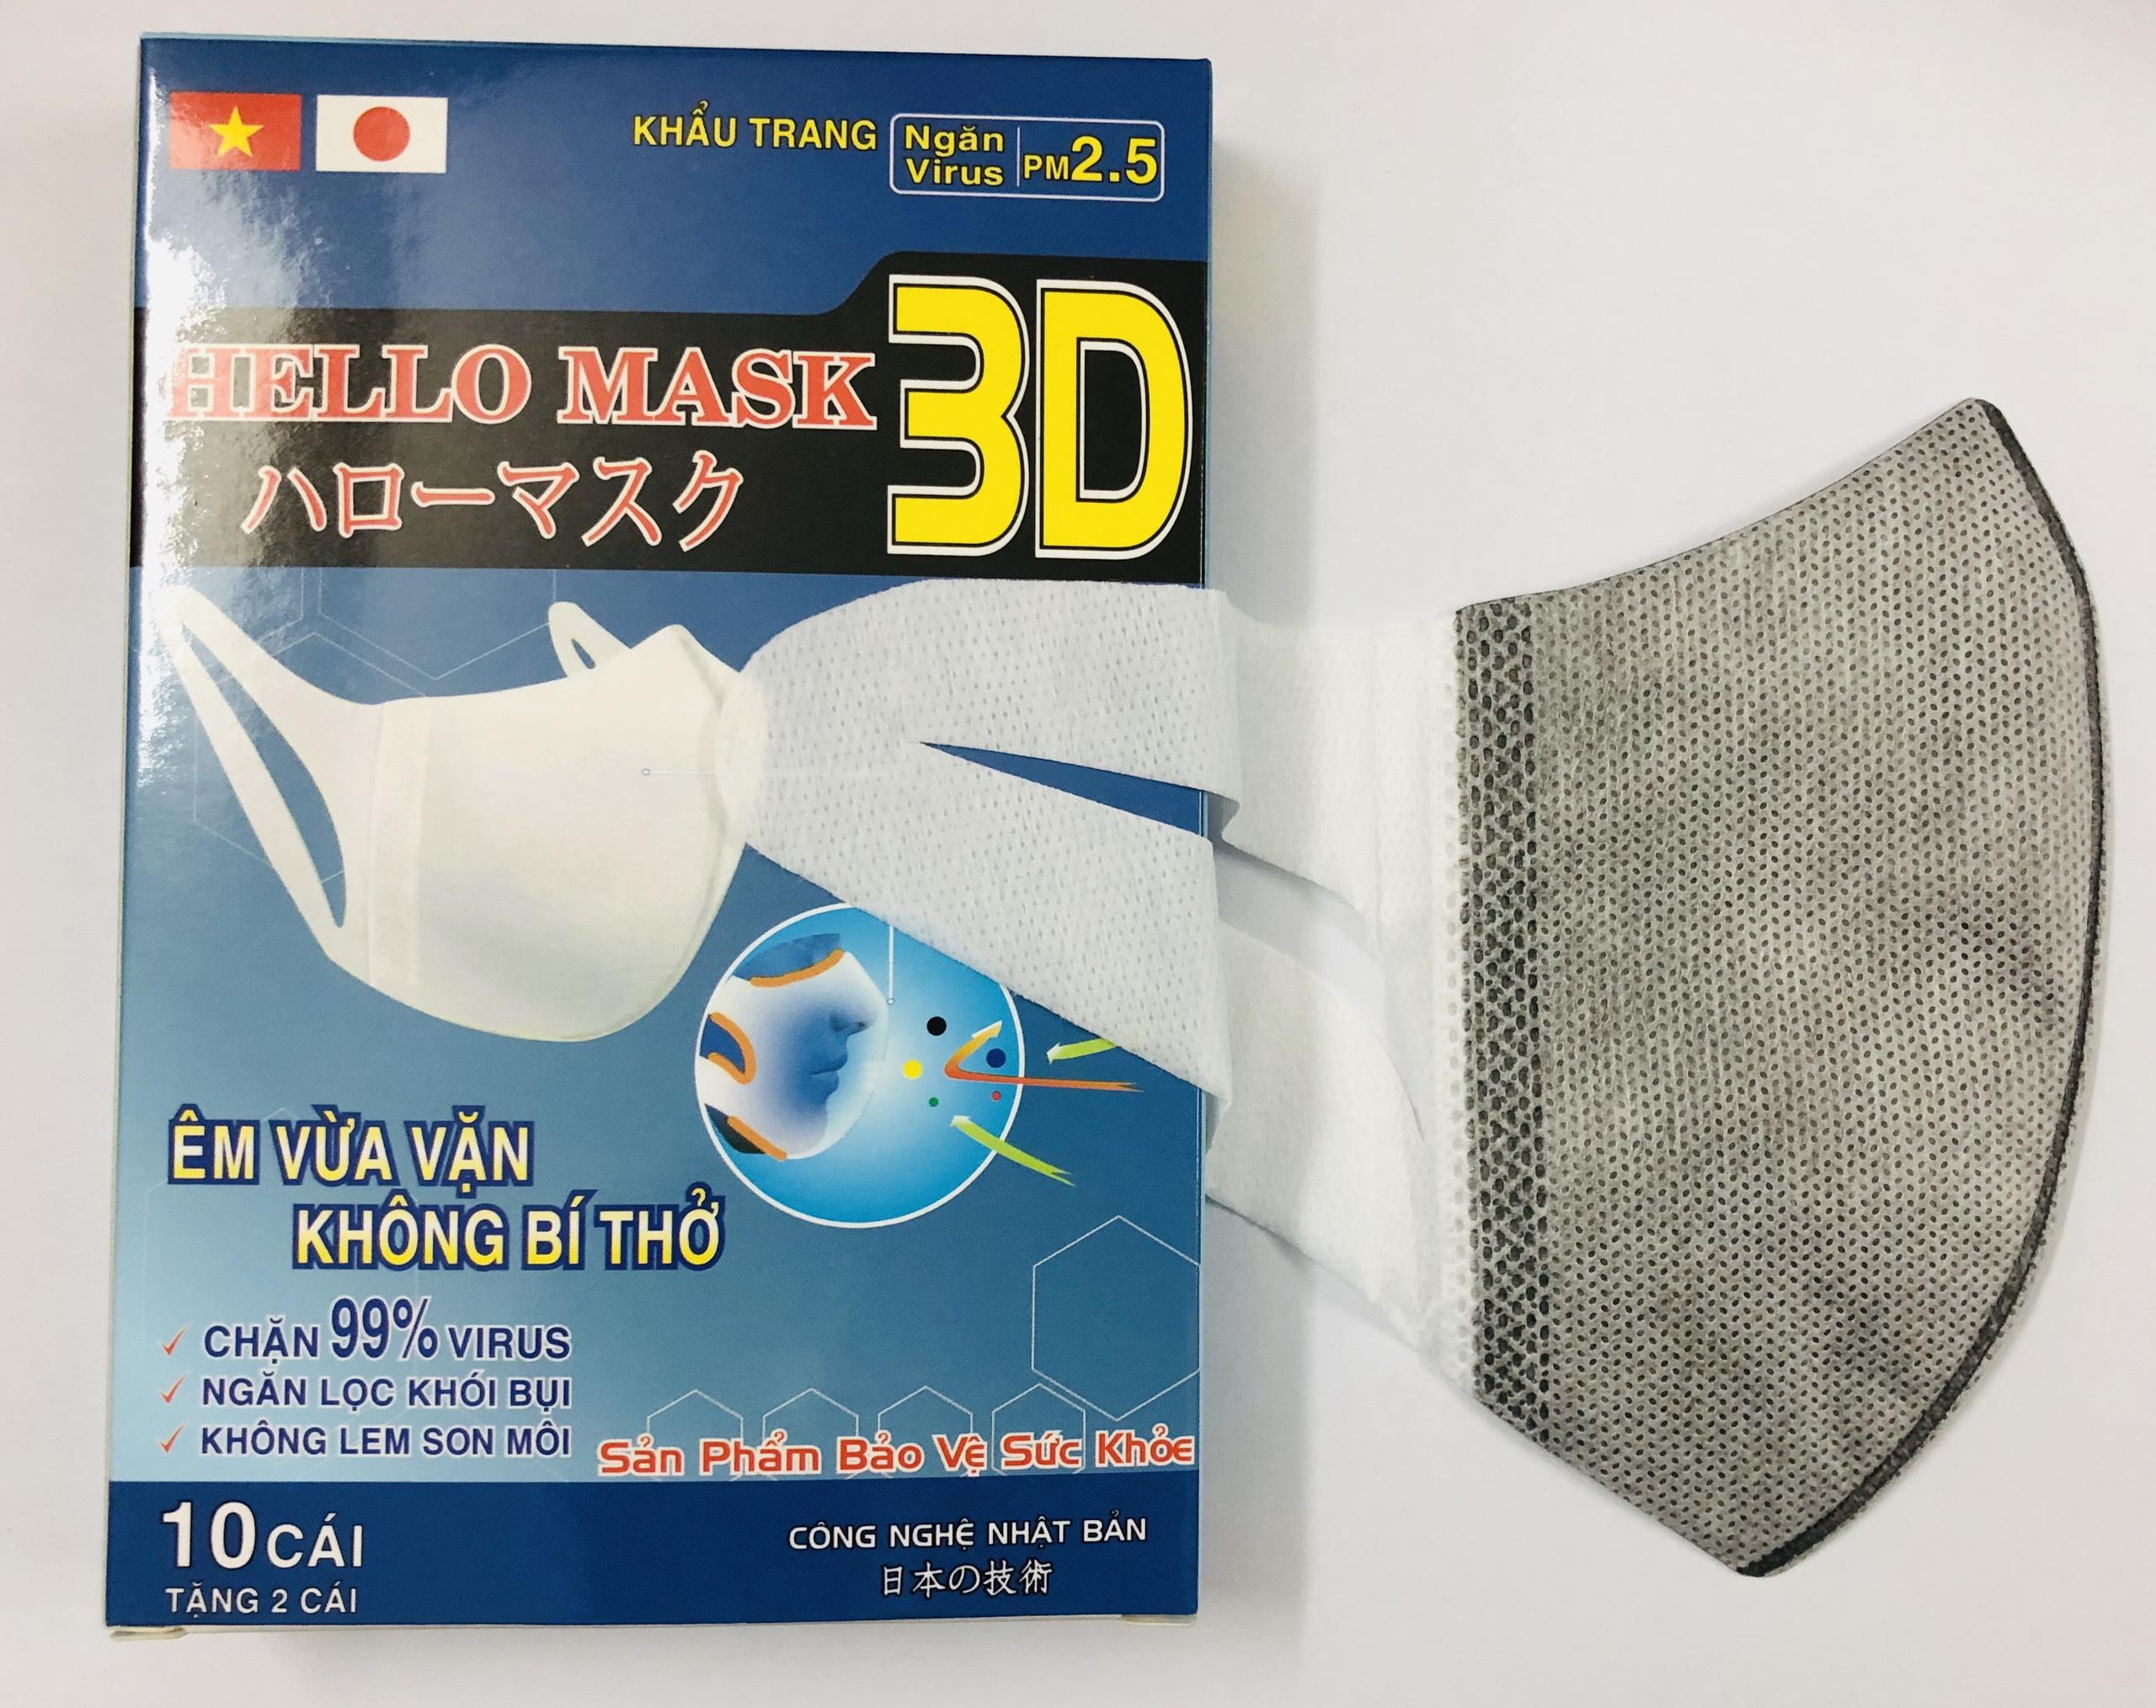 Khẩu Trang 3D Hello Mask 10 tặng 2 cái - Màu Xám